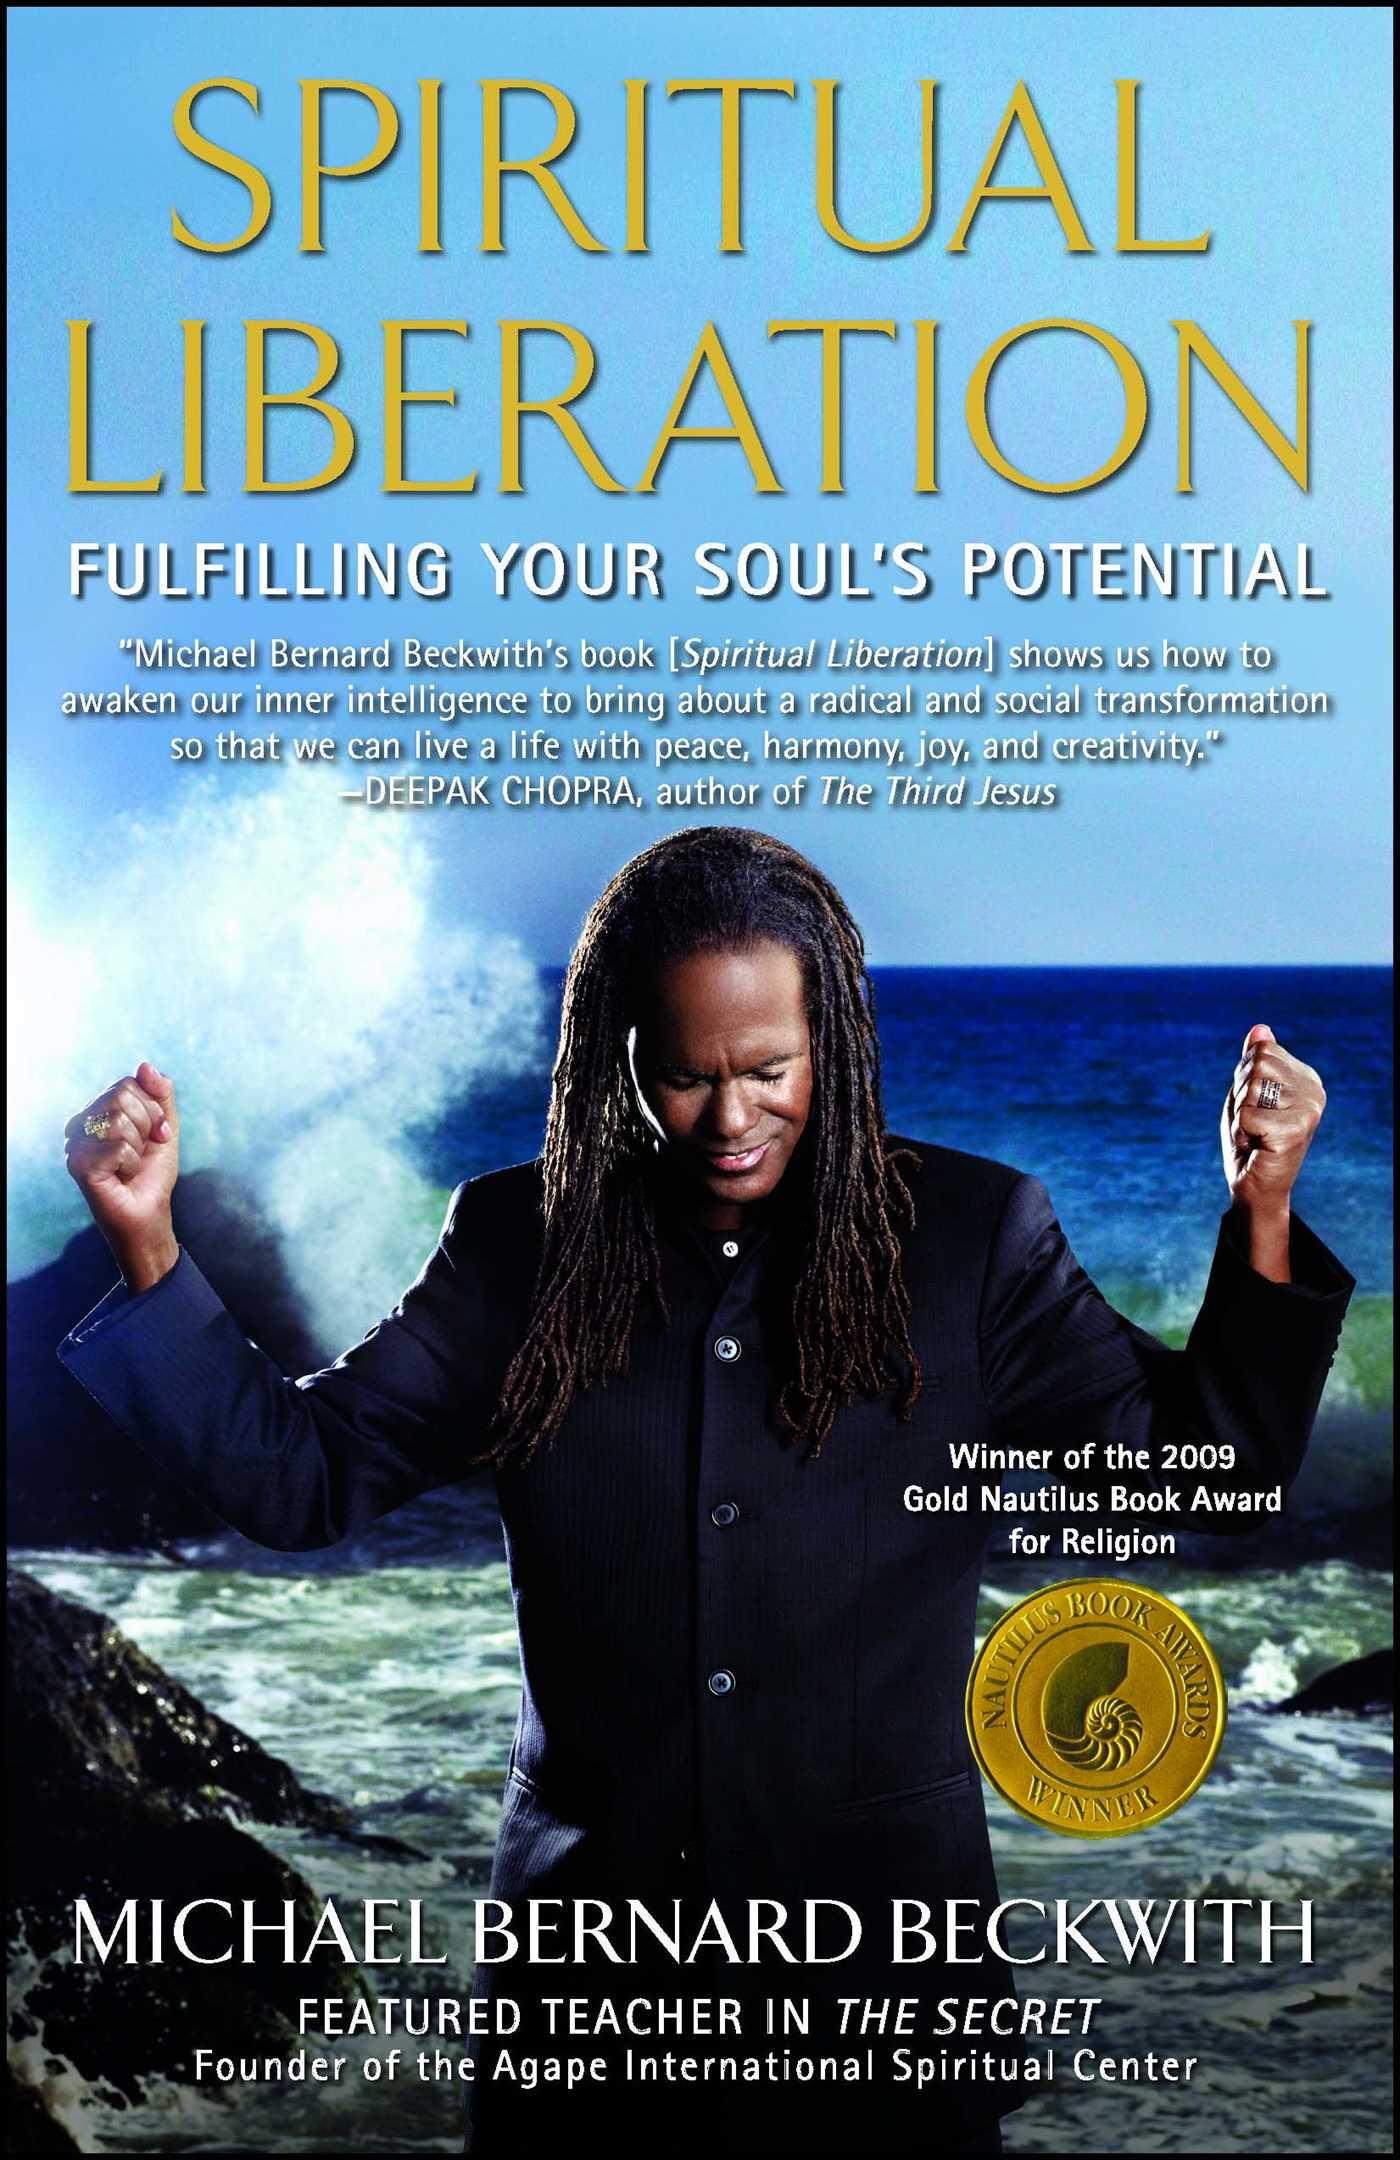 Spiritual liberation 9781582702056 hr